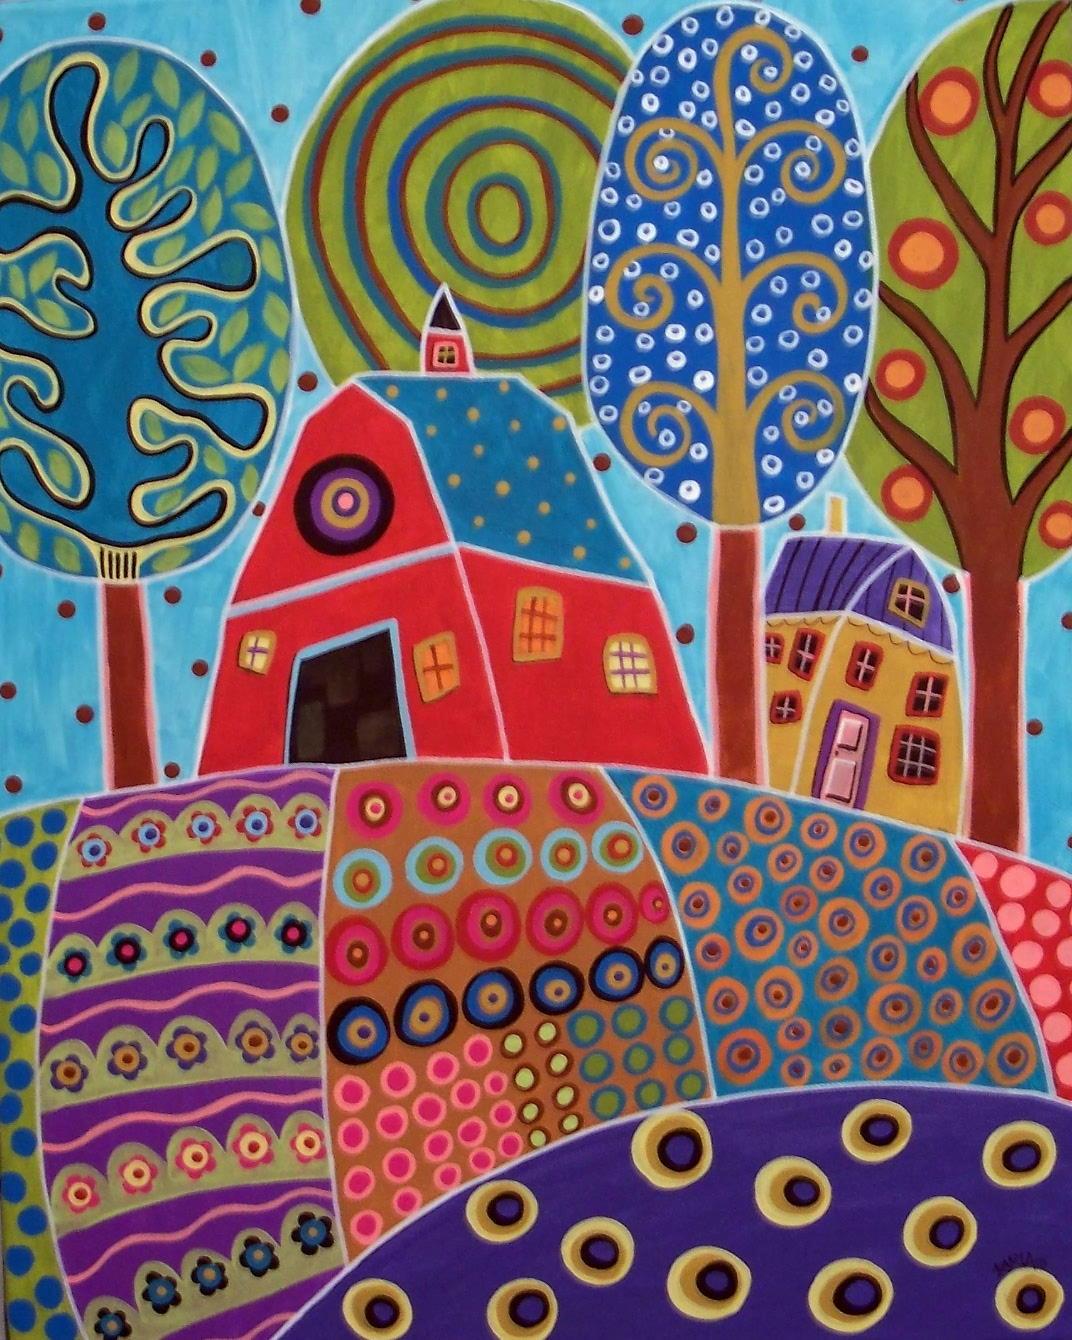 Karla gerard art 3 new paintings by karla g for Arts de la maison